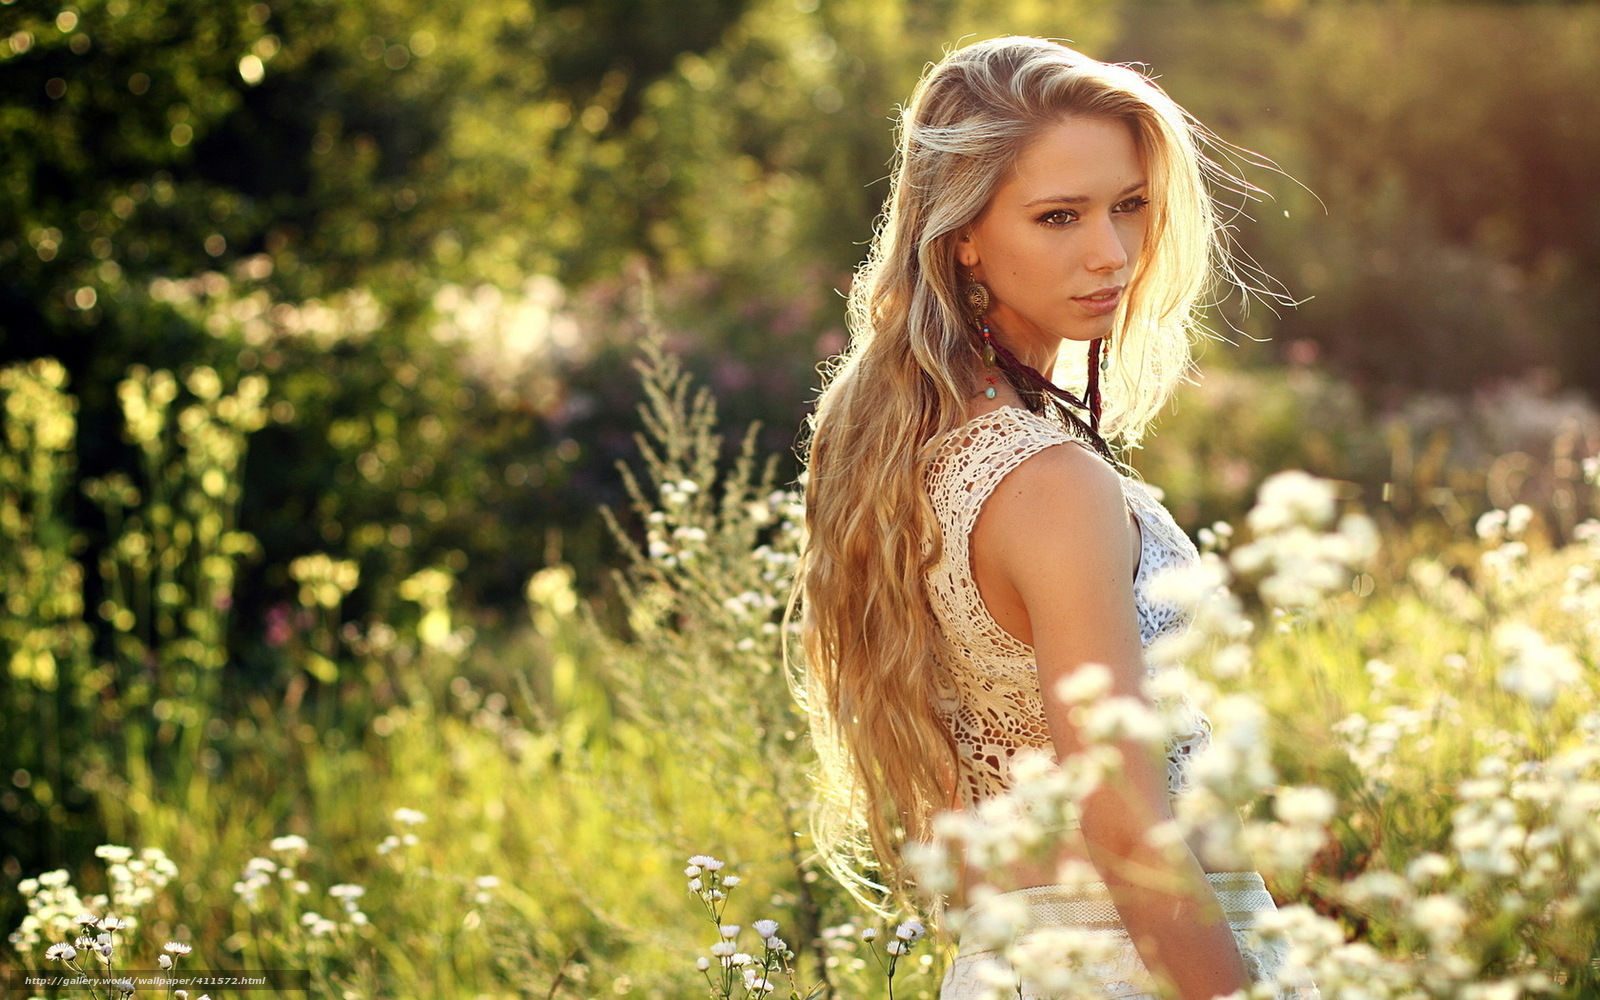 Девушки онлайн на природе 21 фотография